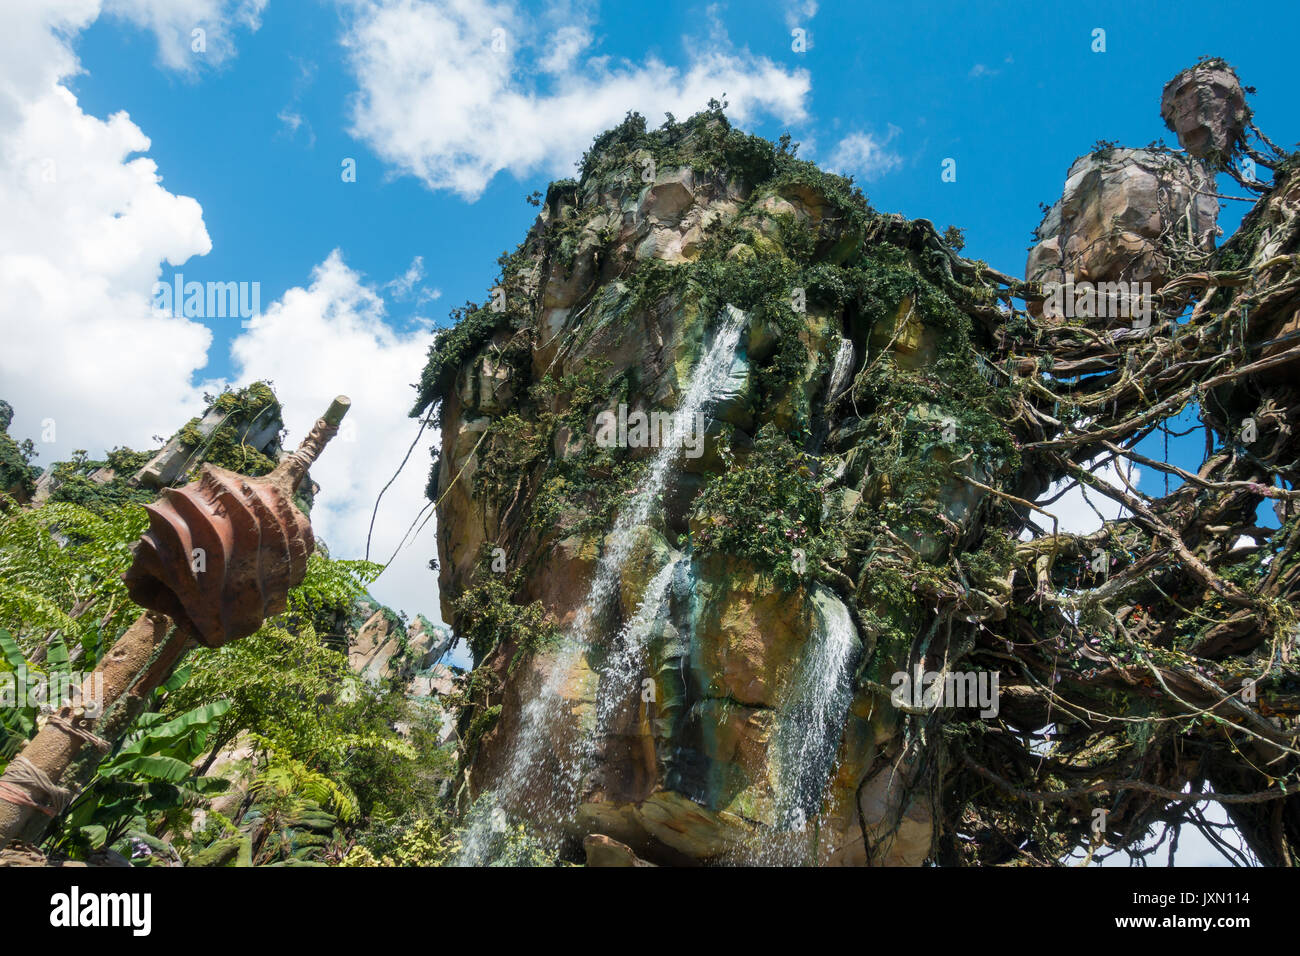 Montagne flottante in Pandora, avatar land, regno animale, Walt Disney World, a Orlando, Florida. Immagini Stock